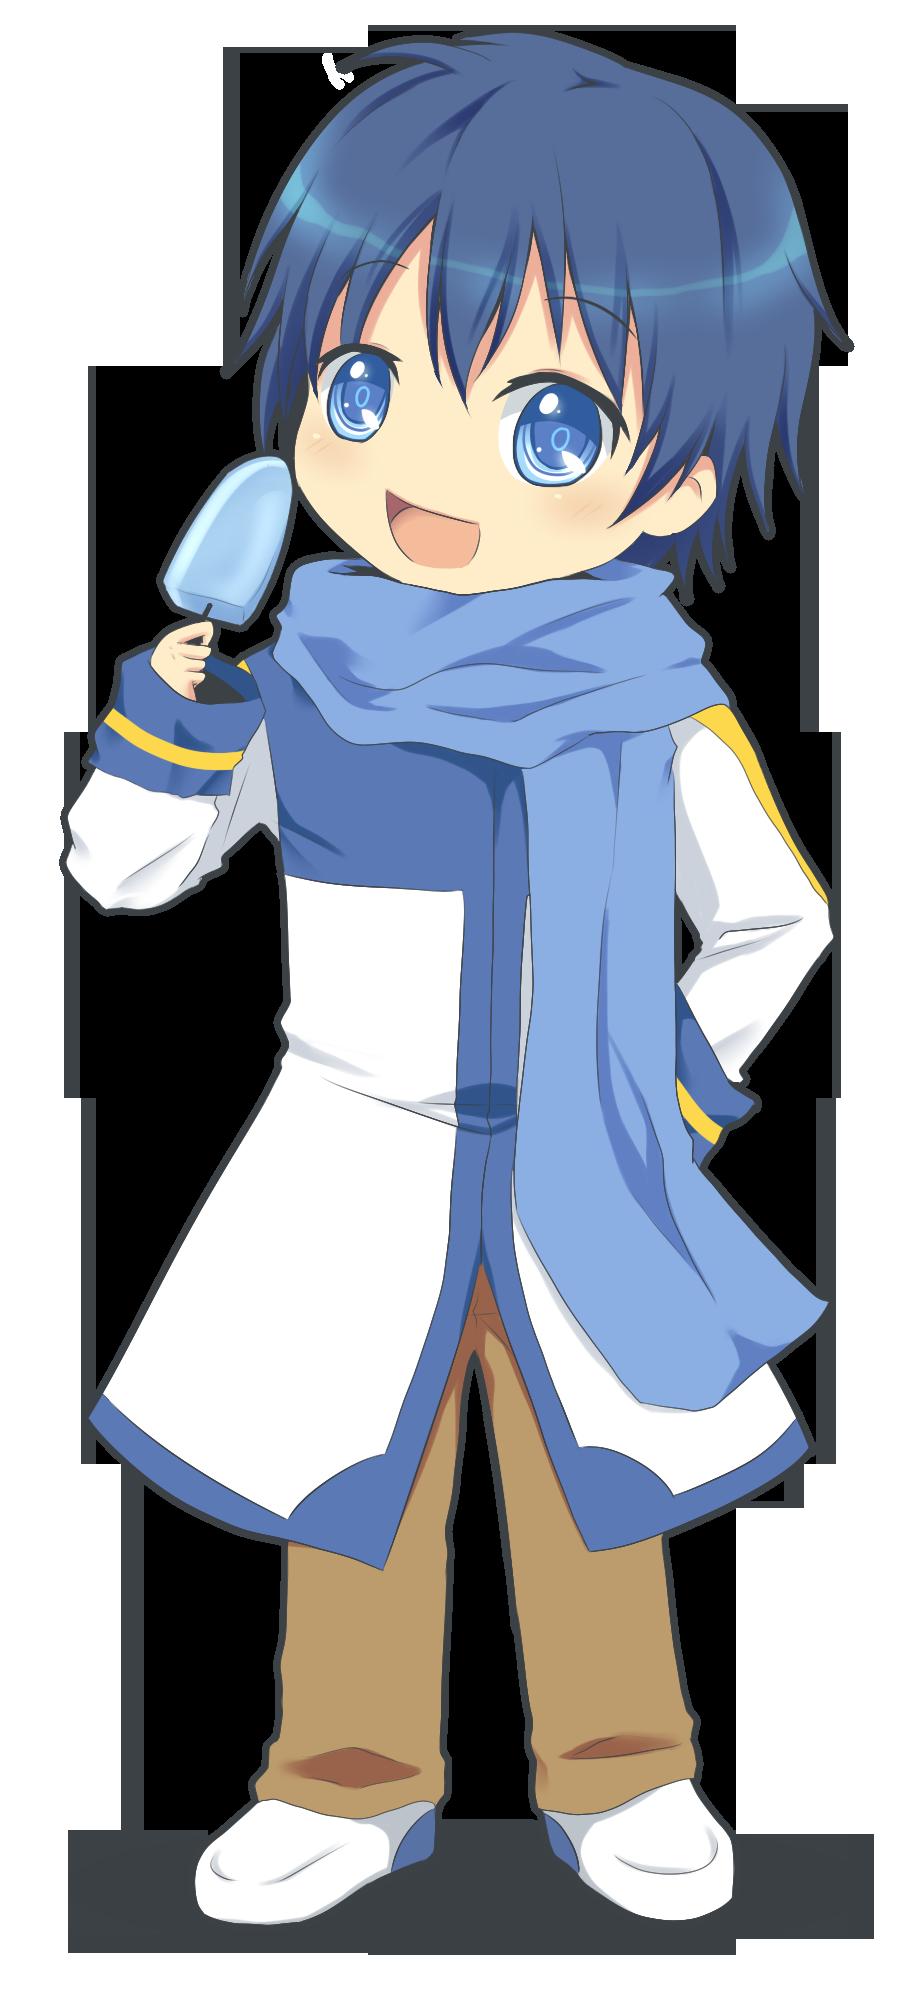 Kaito chibi | Vocaloids | Pinterest | Kaito and Chibi